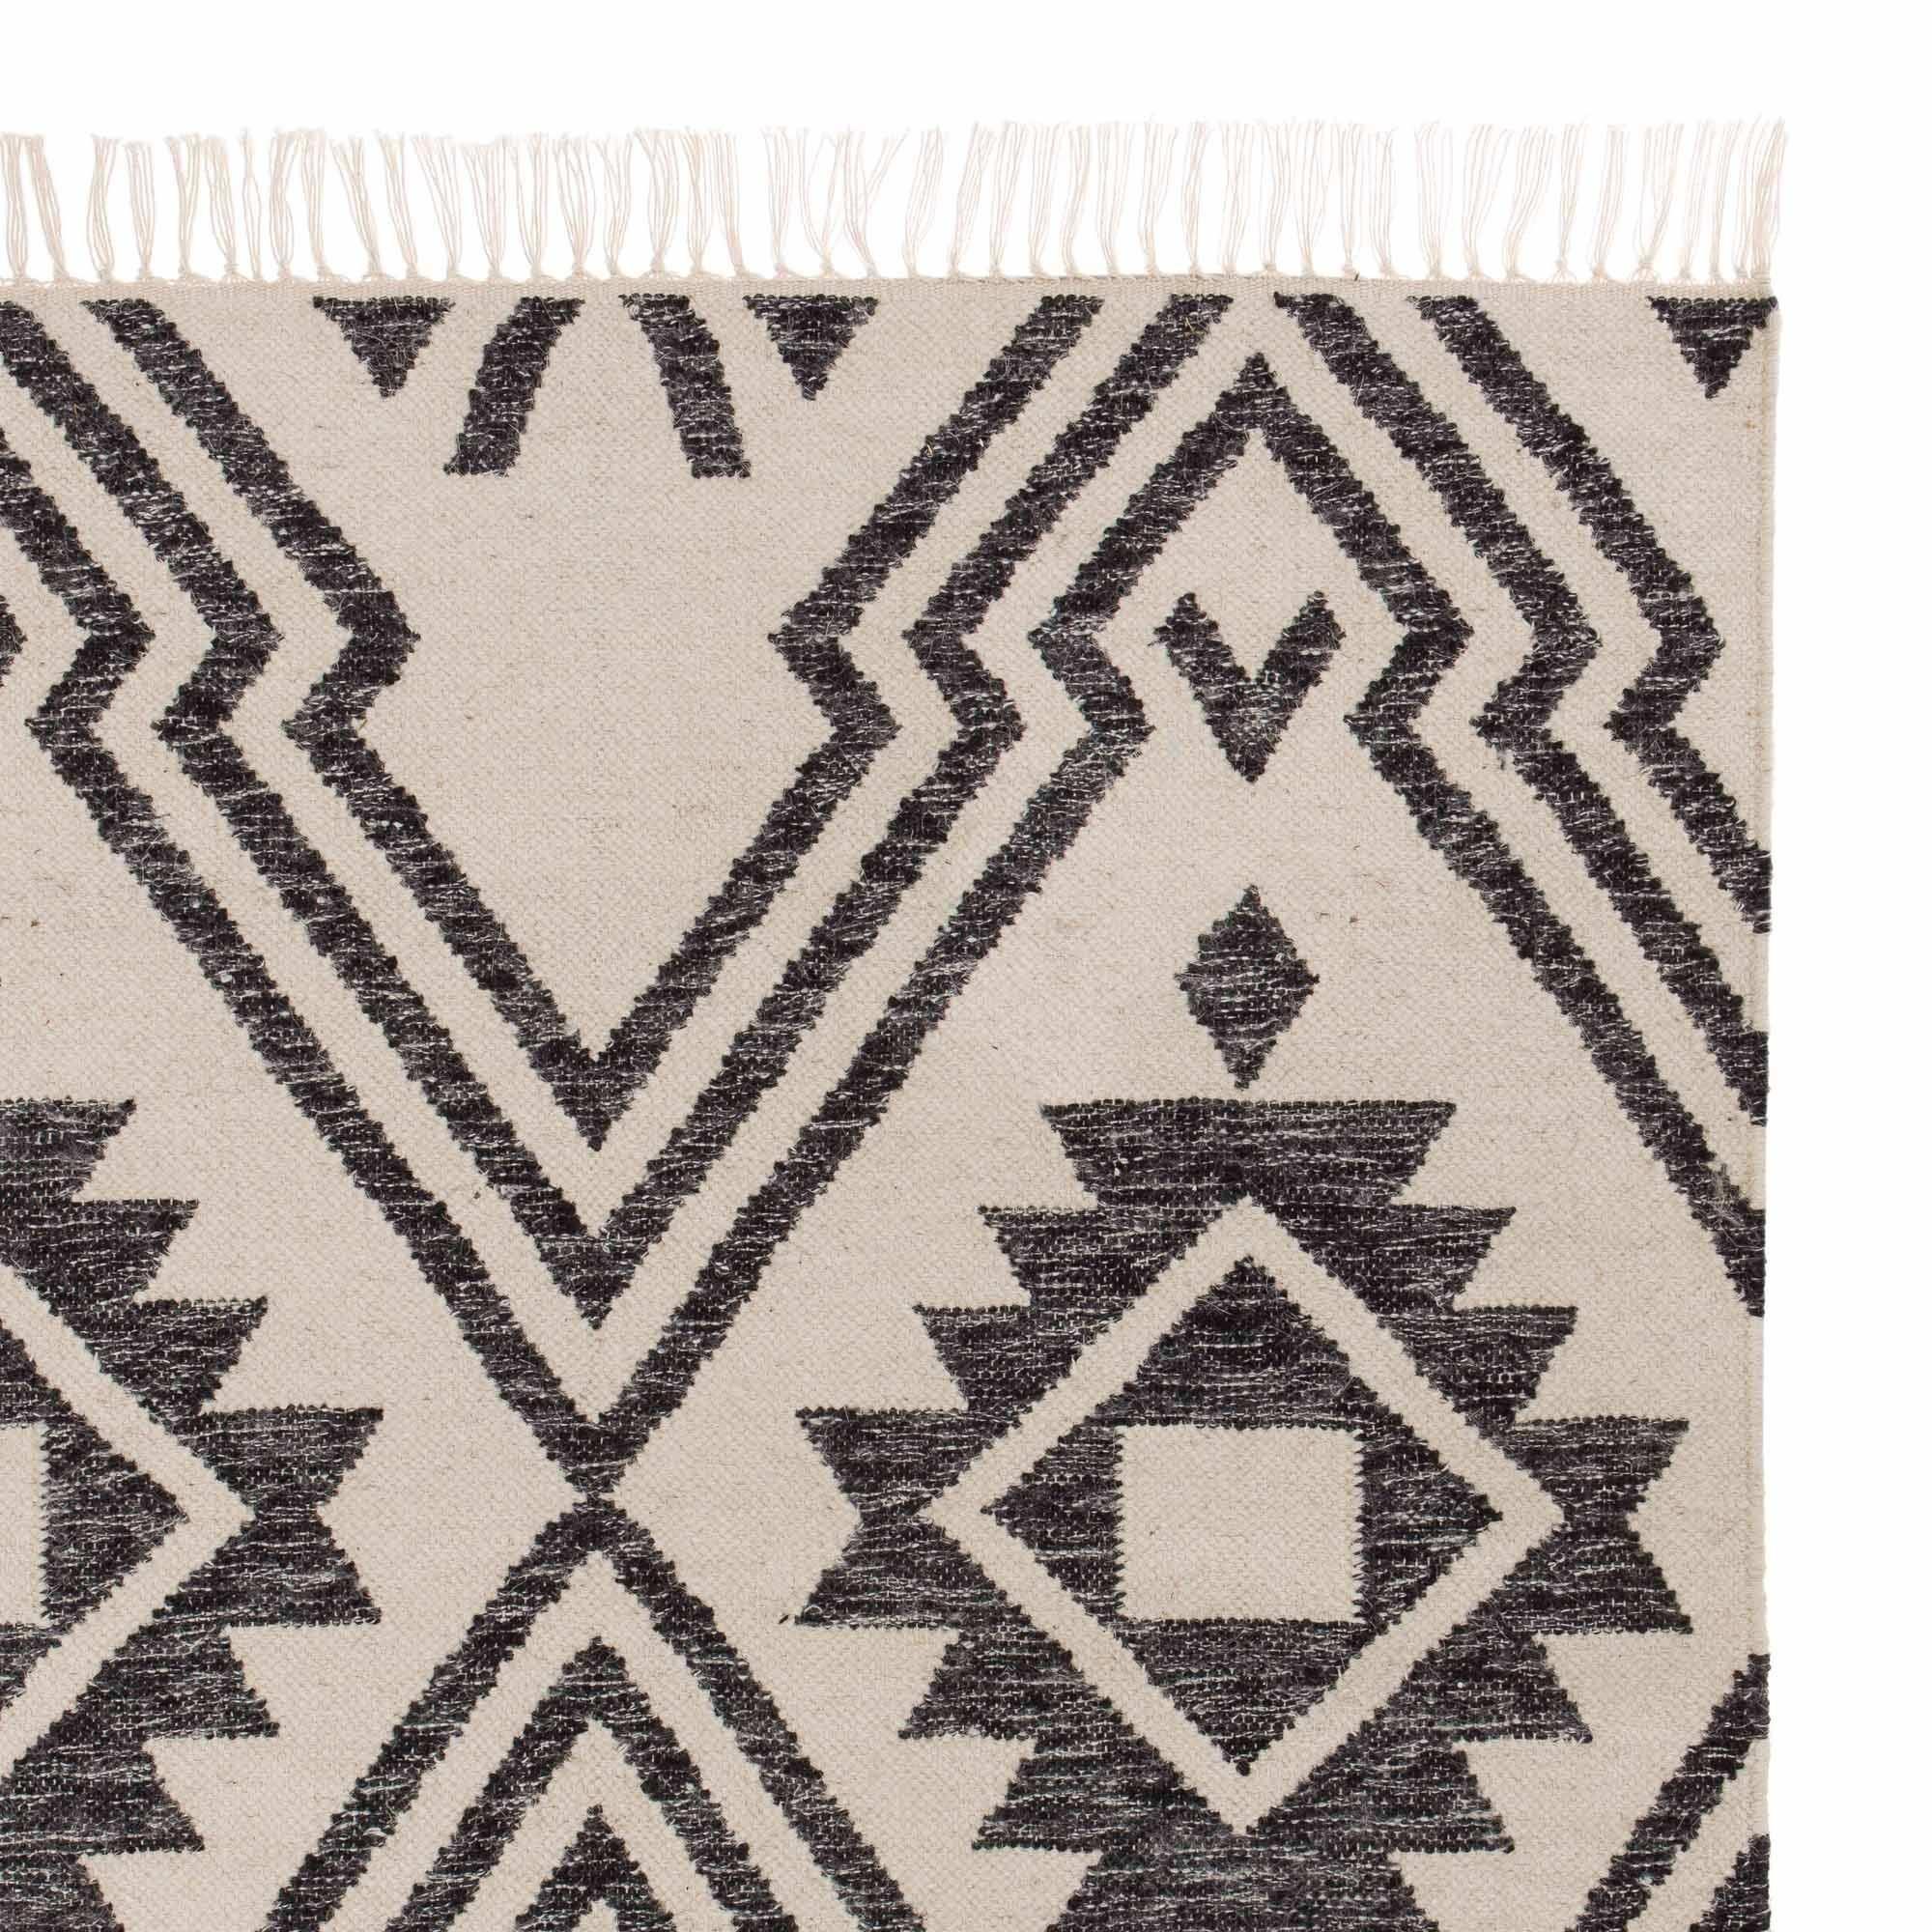 Teppich Seoni Simple Geometric Designs Rugs Rugs On Carpet